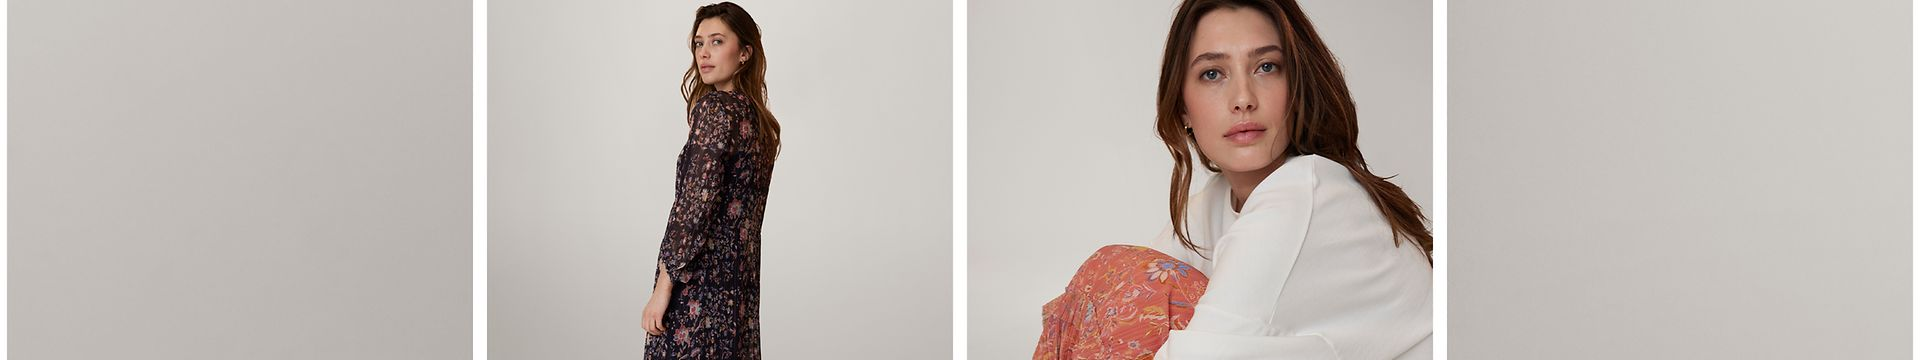 302021 - new - women - TC Banner - Brandnew - wear now - IMG